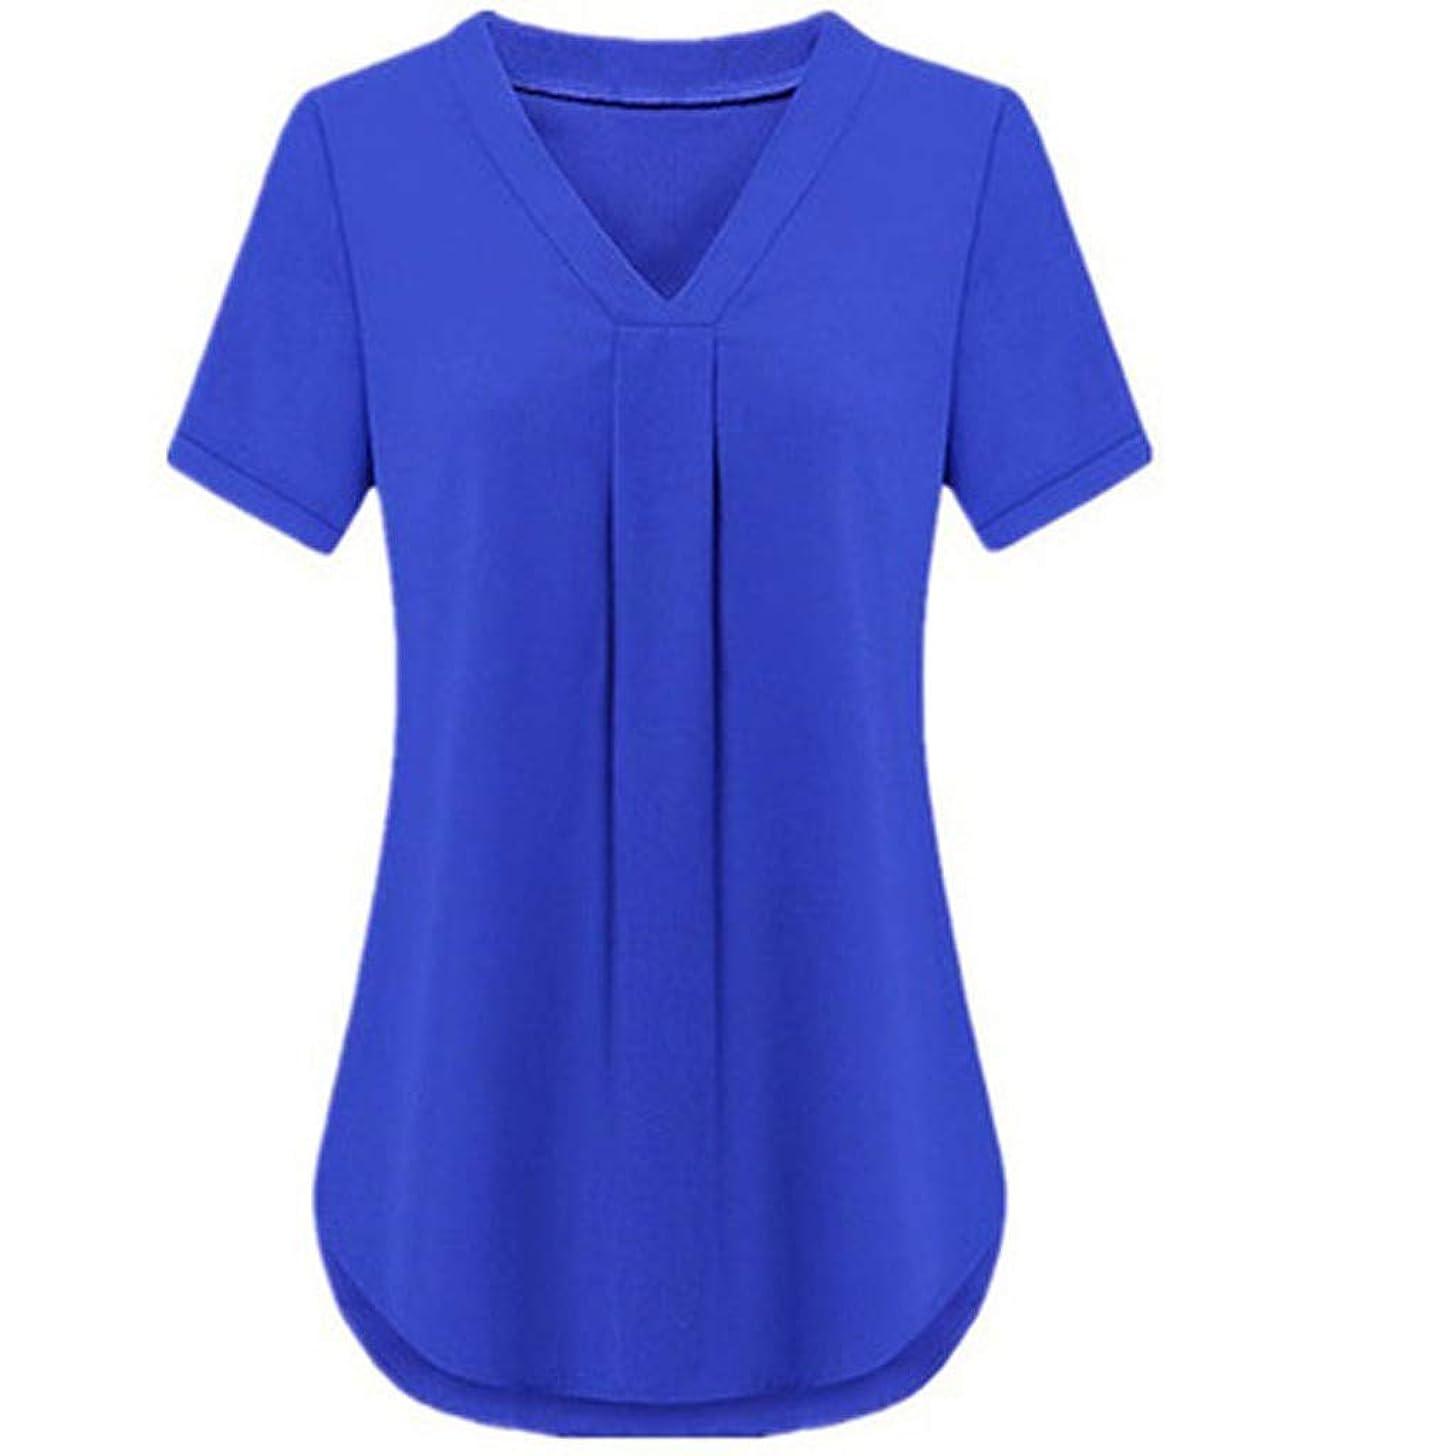 HimTak Women's Fashion Short-Sleeved v-Neck Casual Shirt Solid Color Loose Shirt Summer New Comfortable Wild T-Shirt